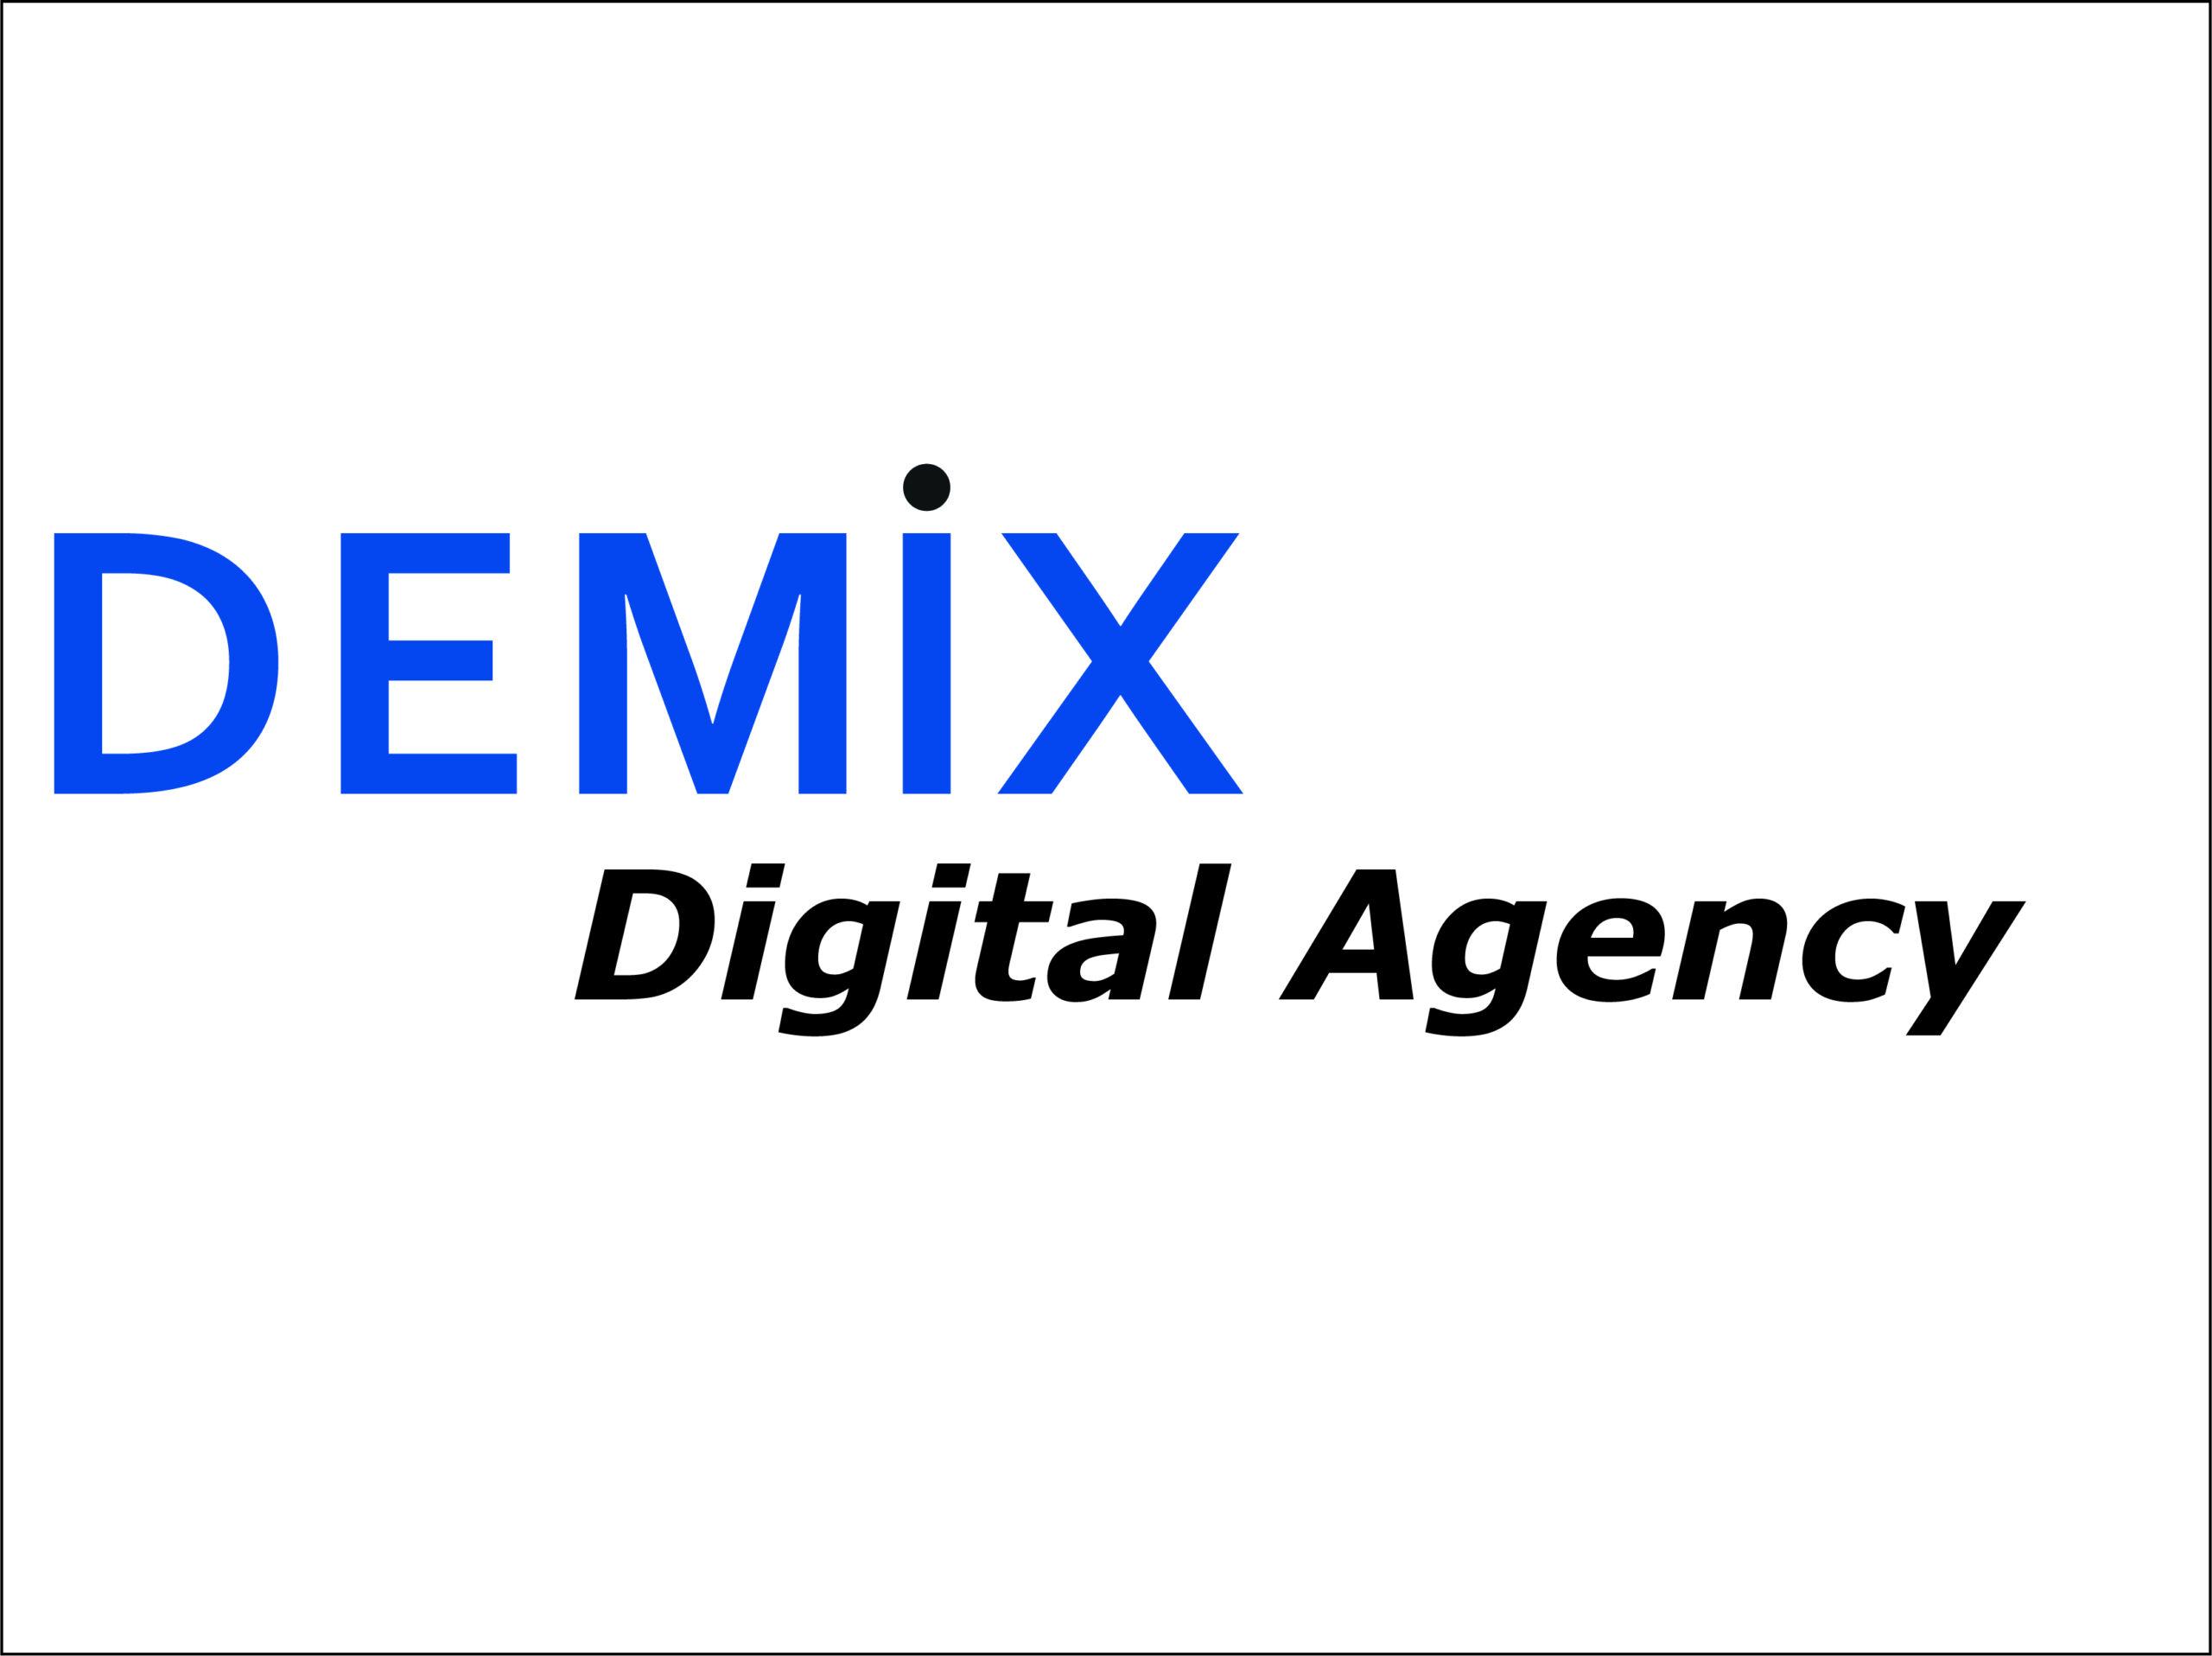 Logo-DEMIX-Digital-Agency